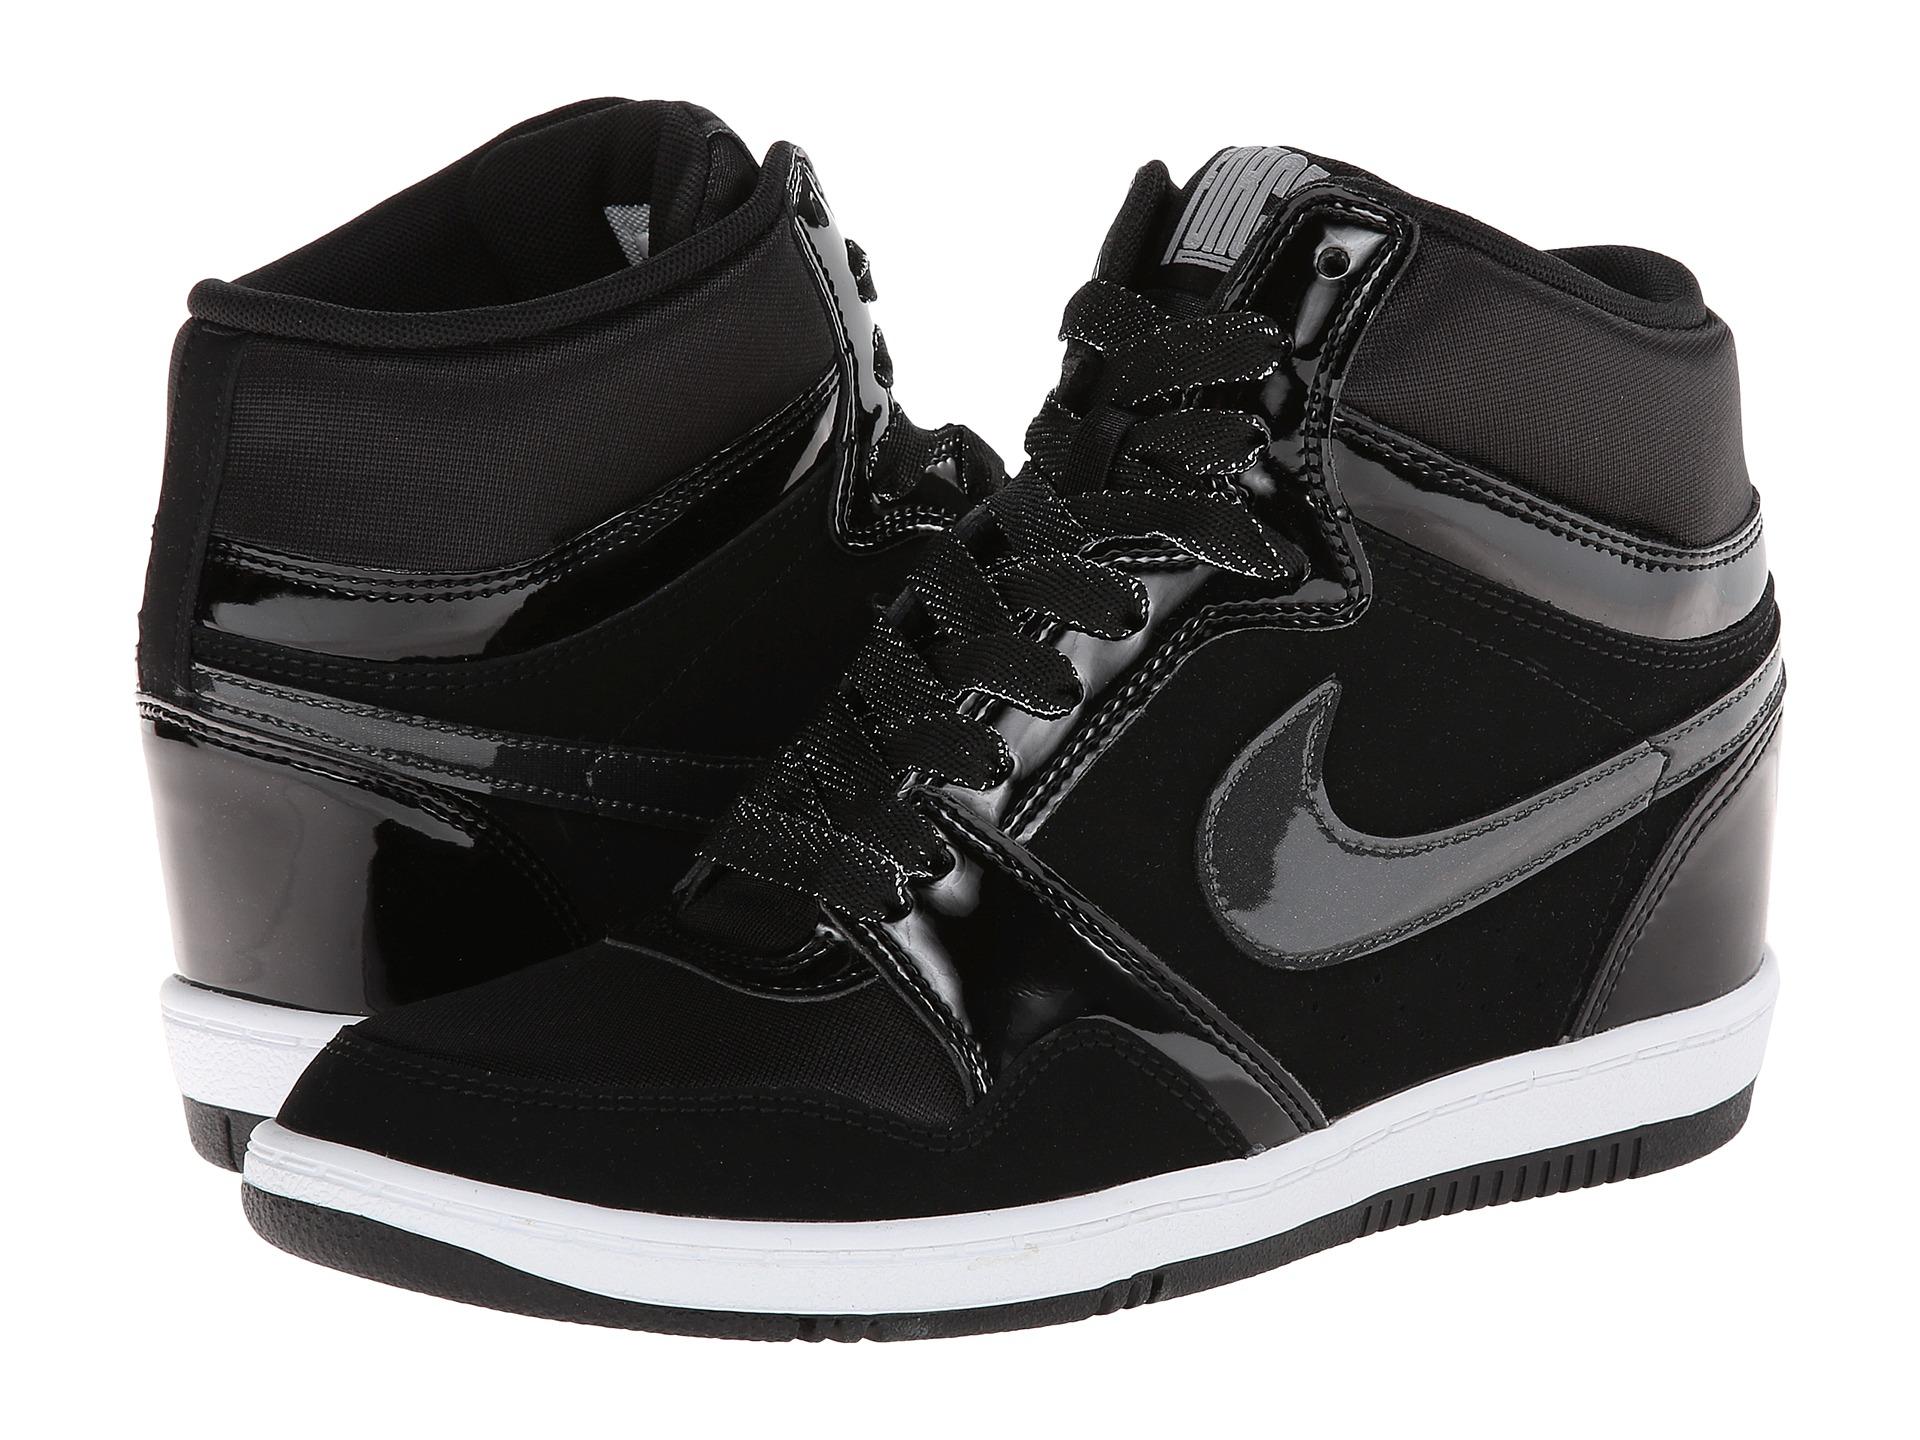 Nike Shoes Black And White Wedge